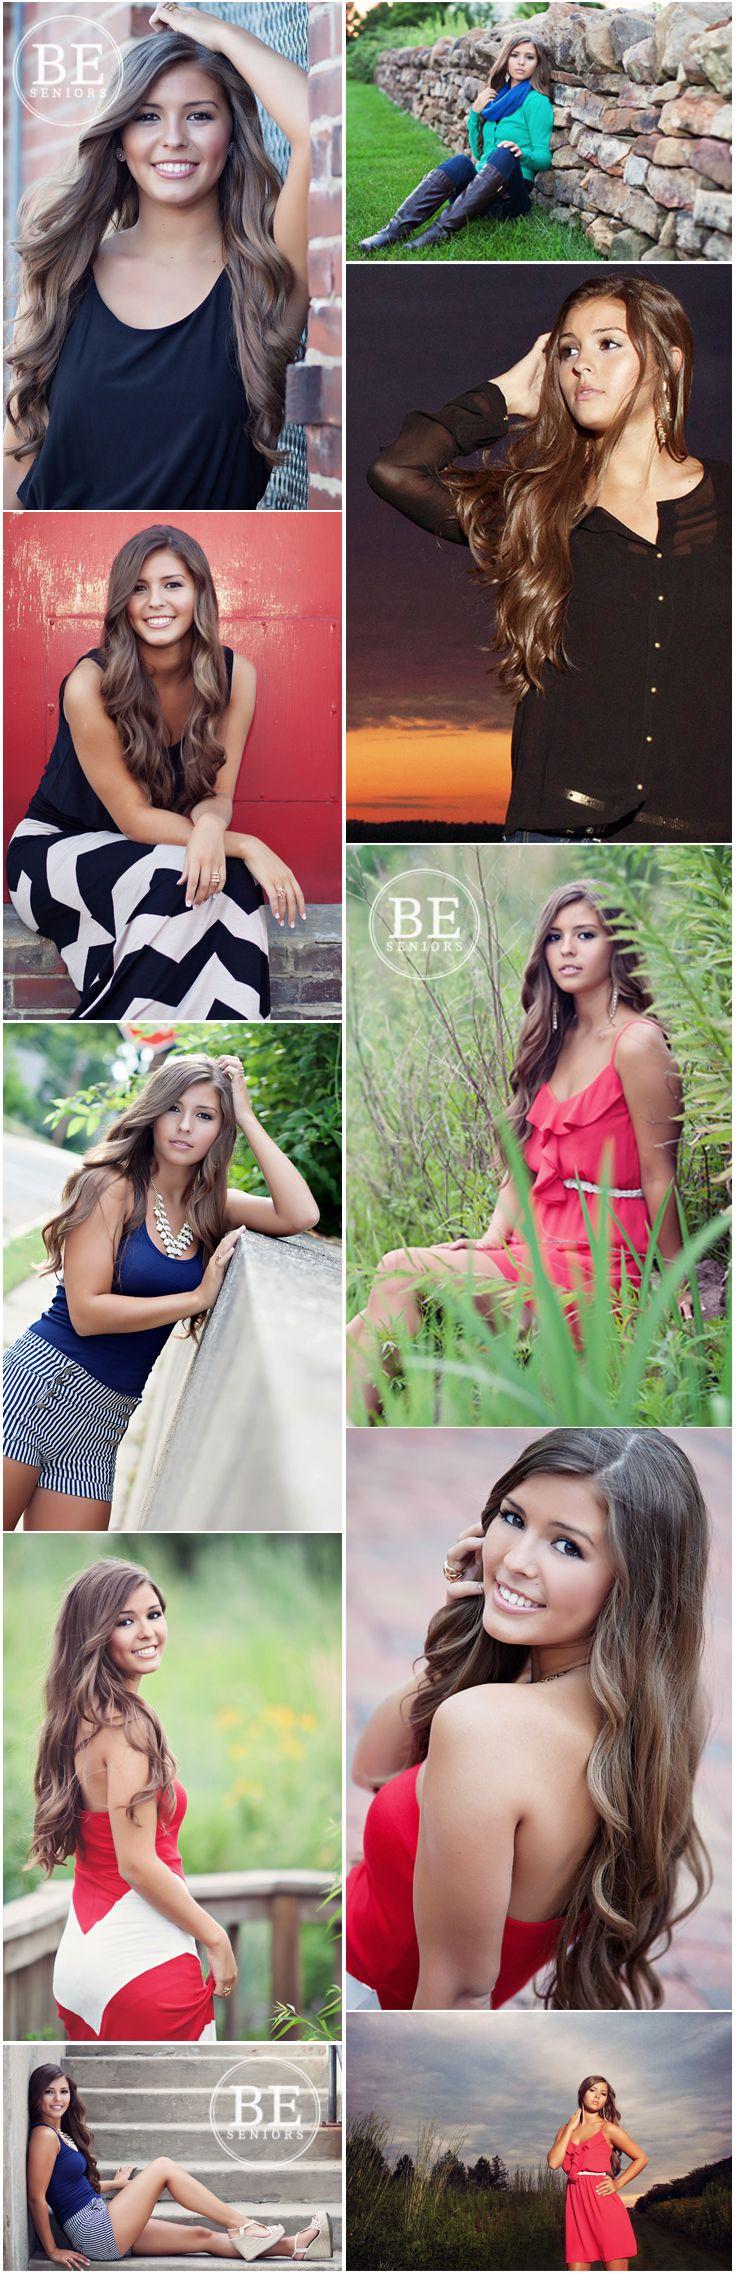 B.E. Senior posing inspiration - Lauren high school senior photos, Bliss Eleven